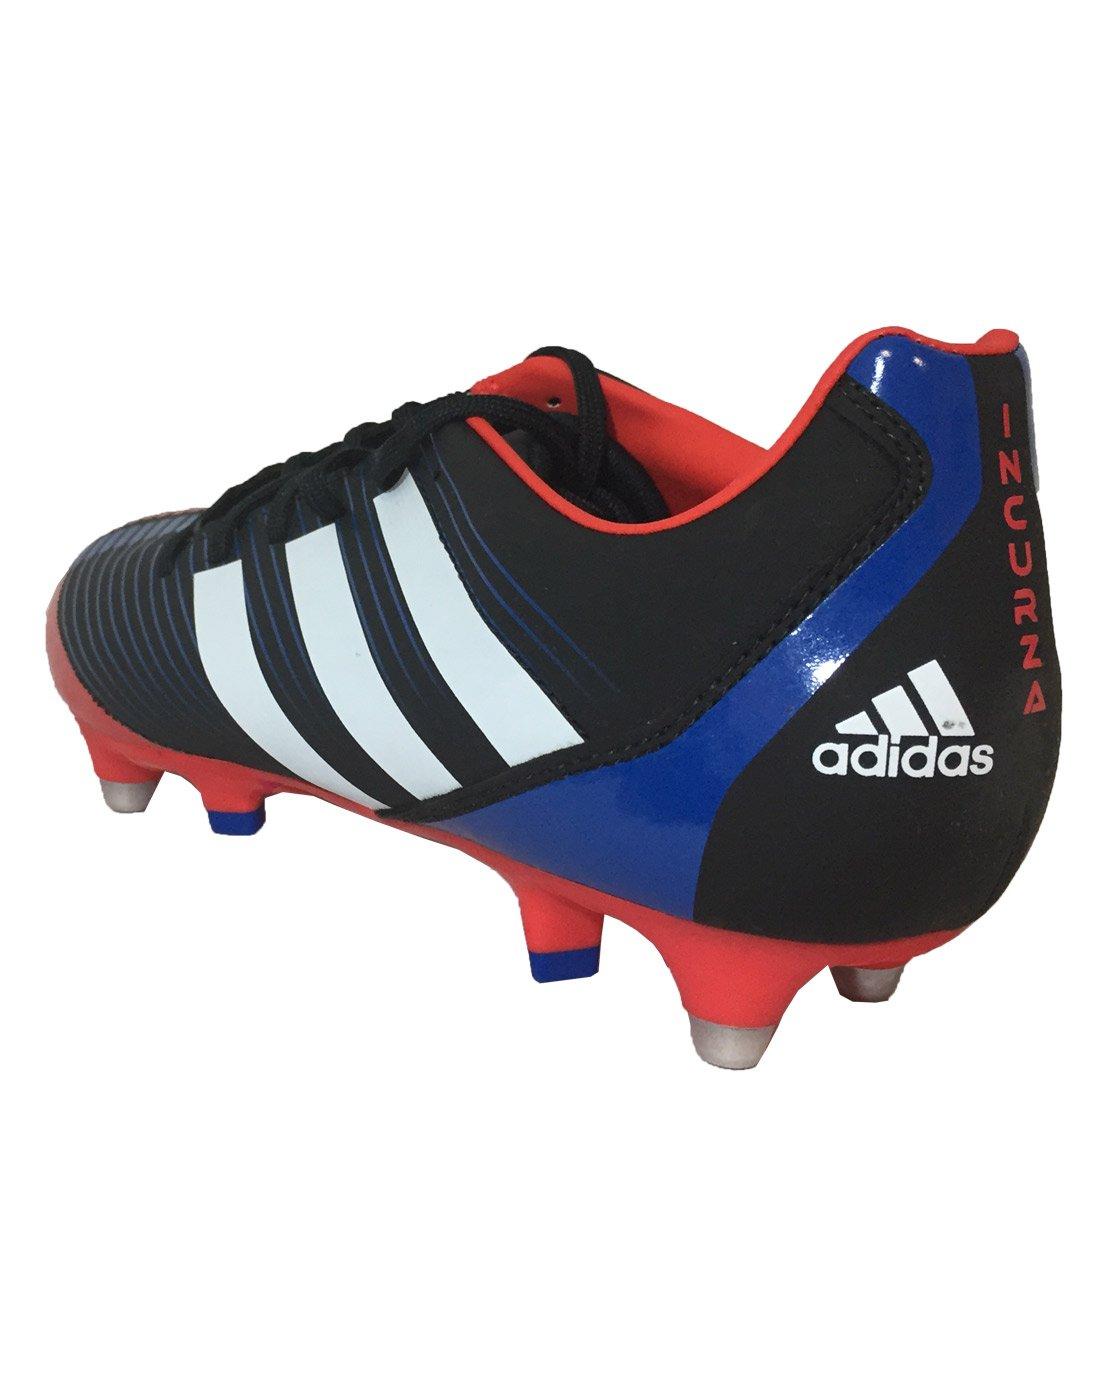 69c67b6b0f6c3 denmark adidas prougeator incurza ii trx fg rugby boots bleu 2e5e7 22ff8